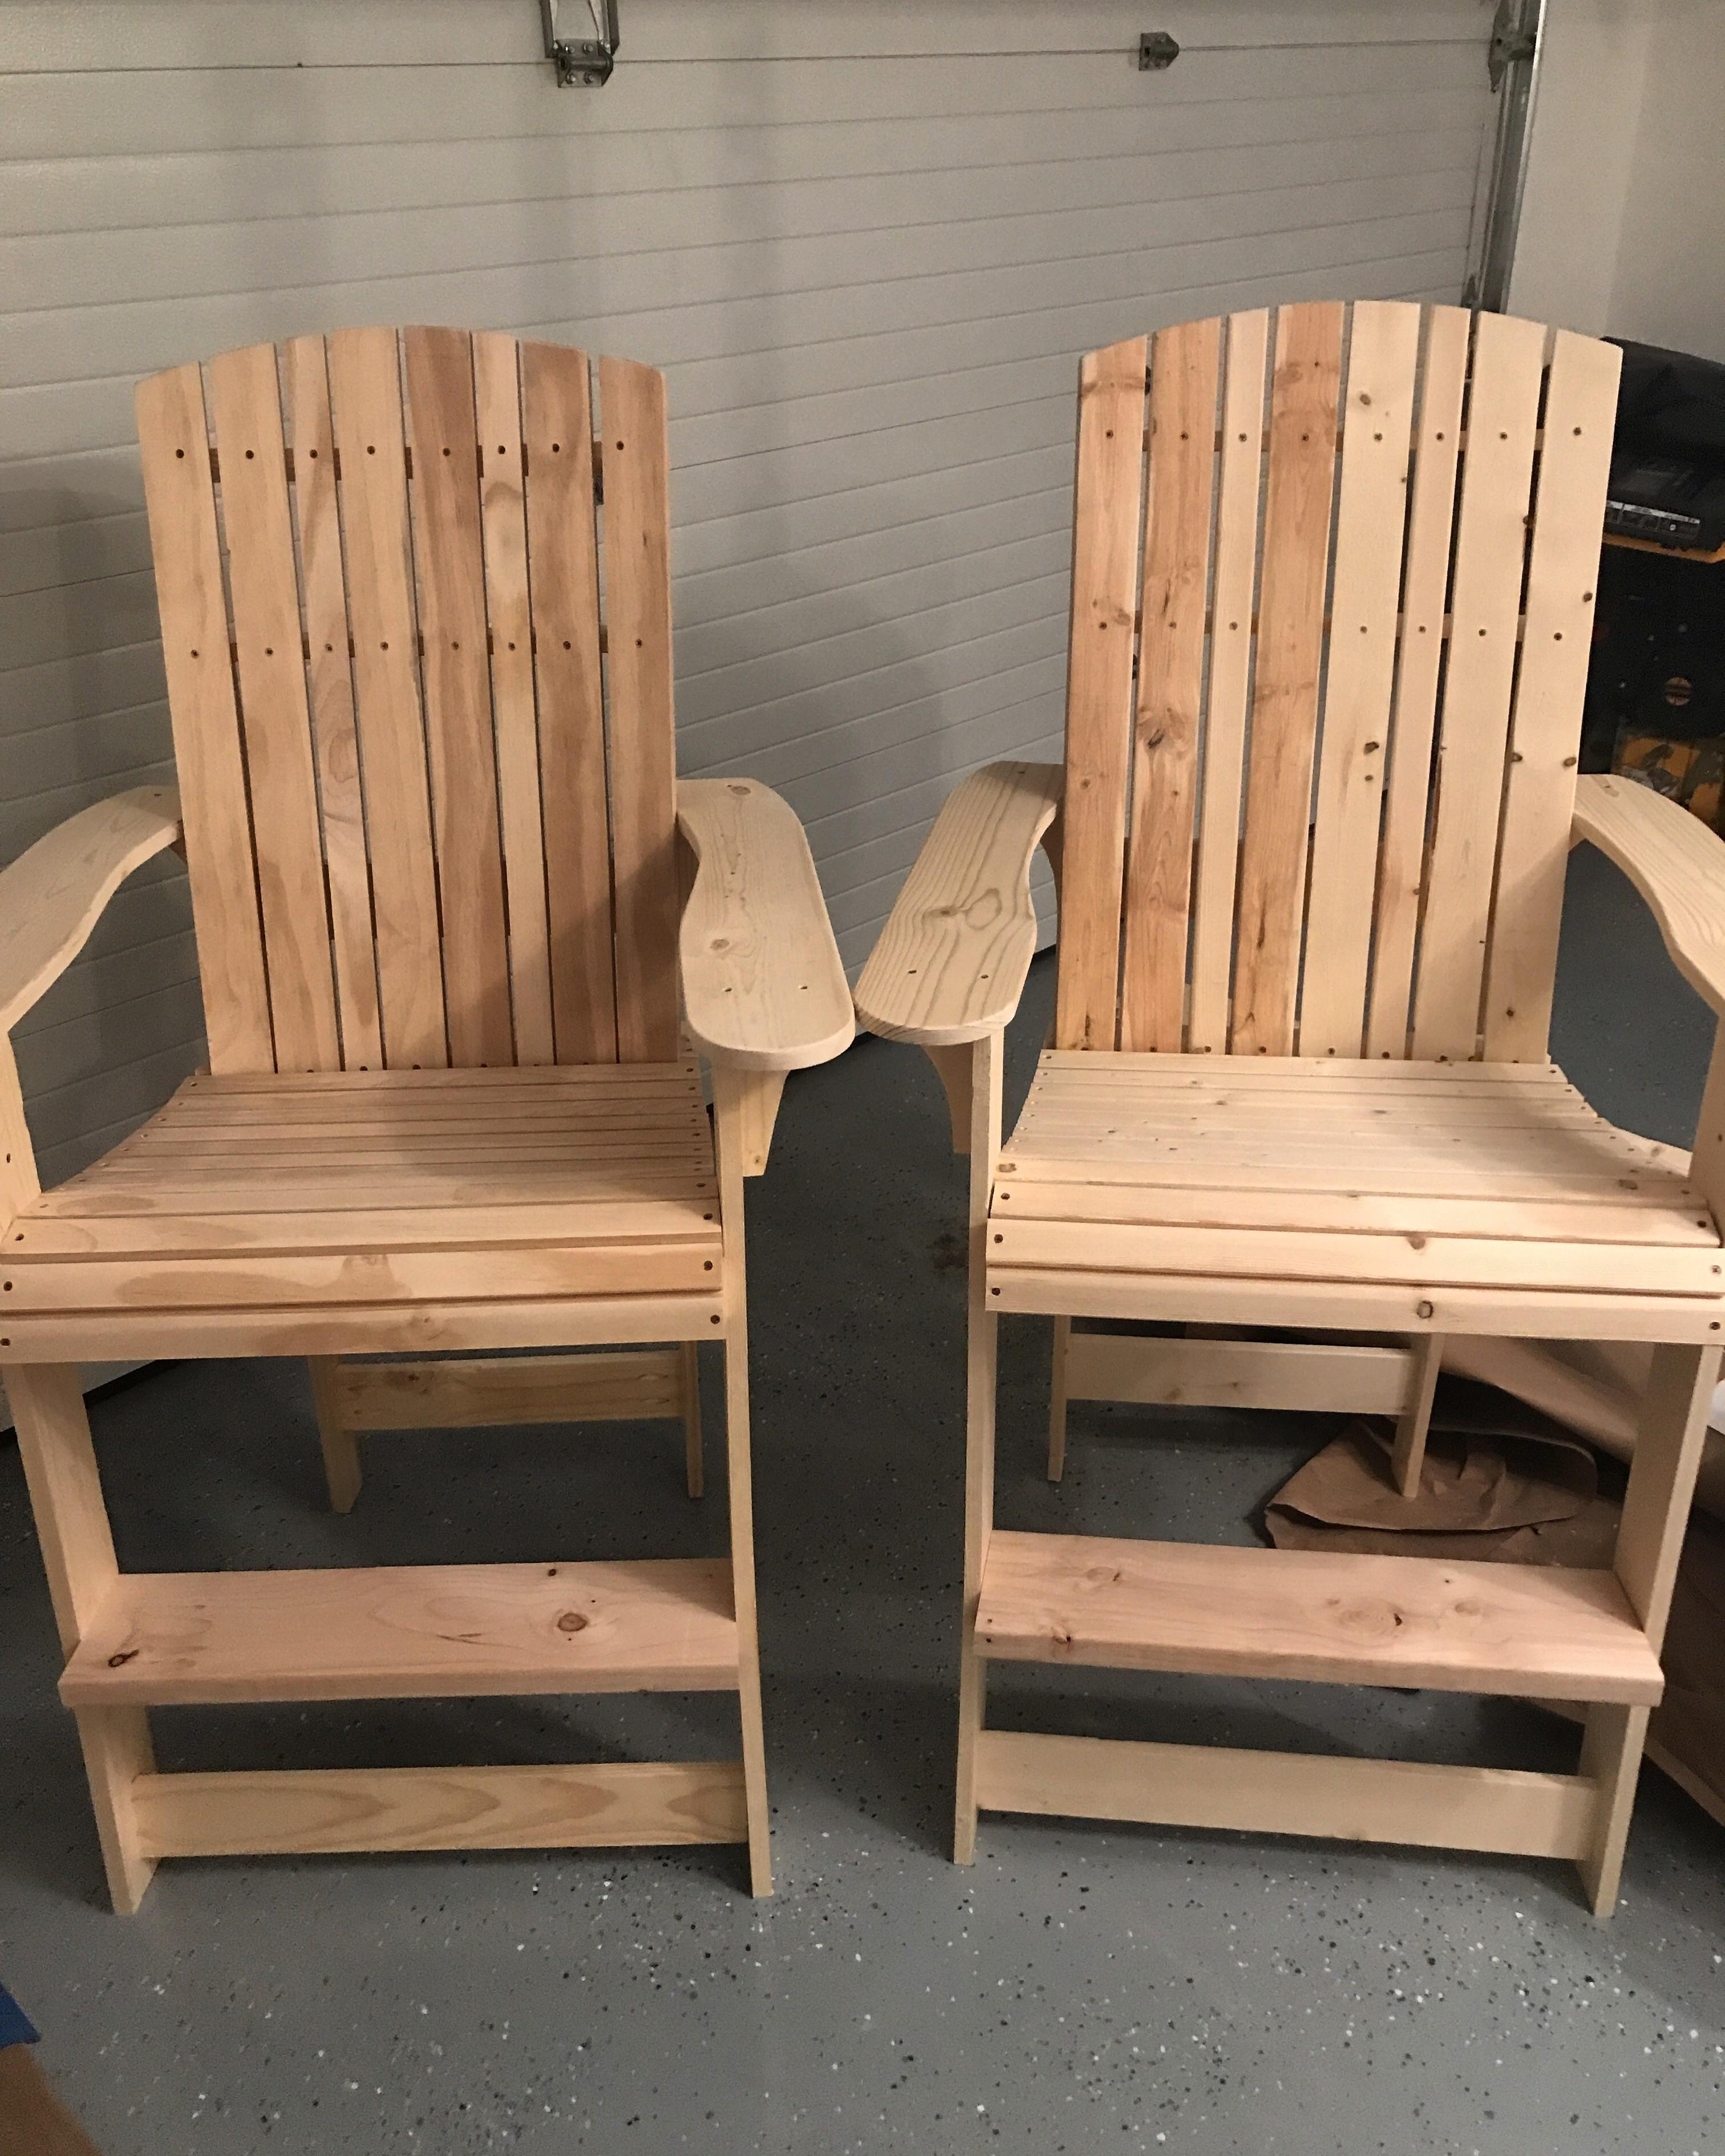 Adirondack chair reclaimed wood diy make this beautiful